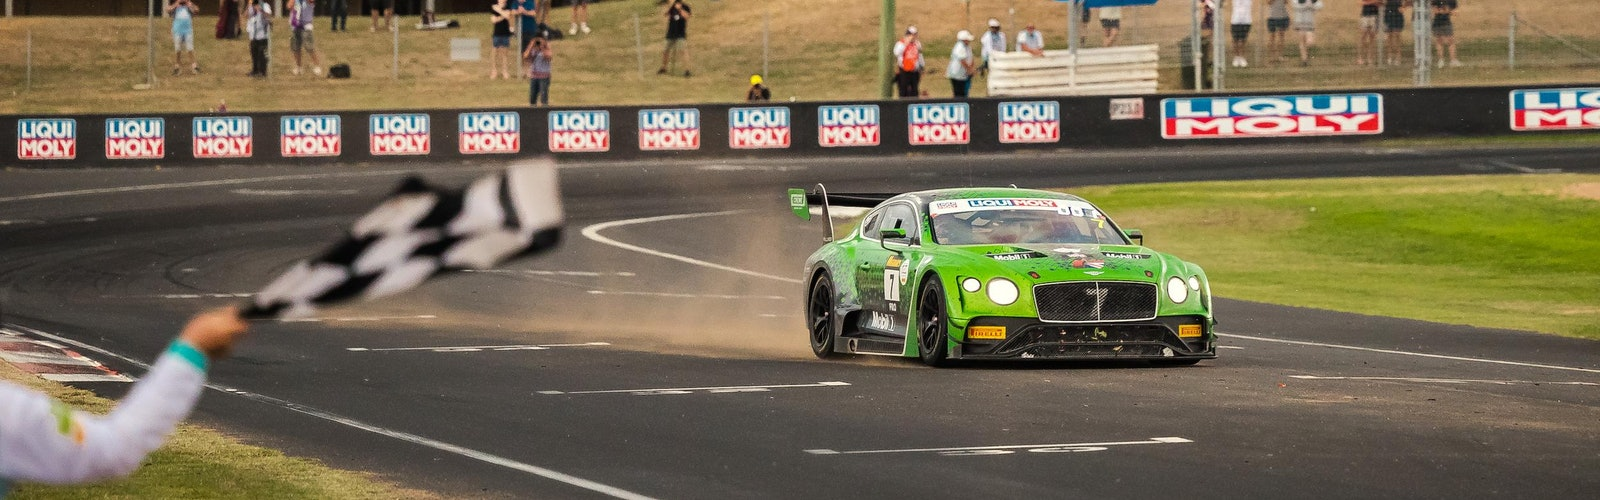 Bentley won Bathurst 12 Hour – 4